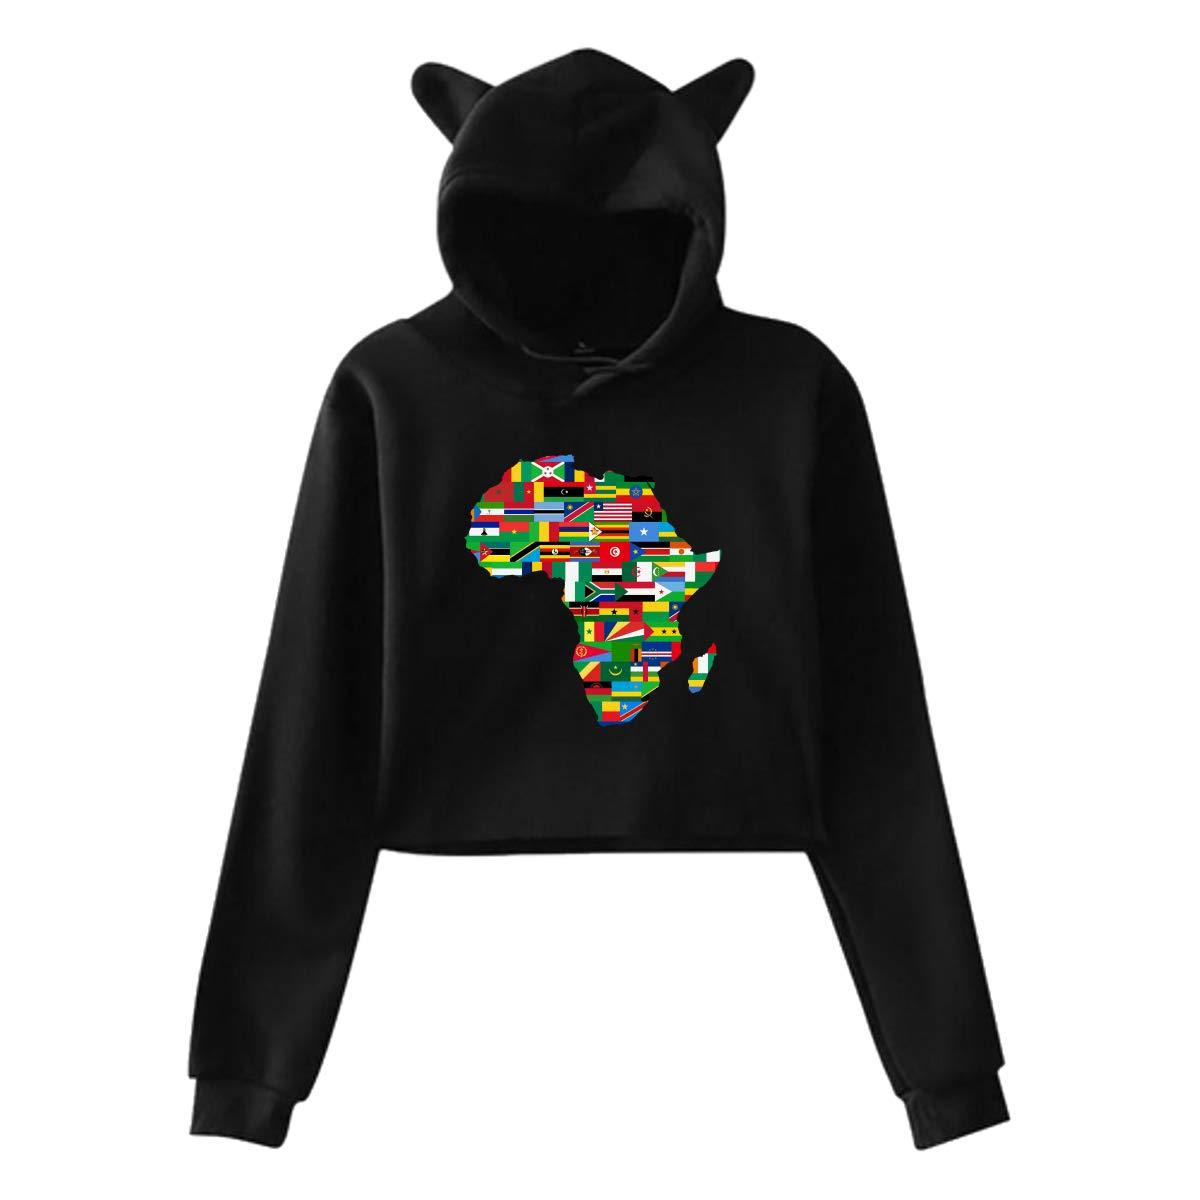 Womens Long Sleeve Crop Top Hoodies Africa Map Flags Cat Ear Lumbar Hoodie Pullover Sweater